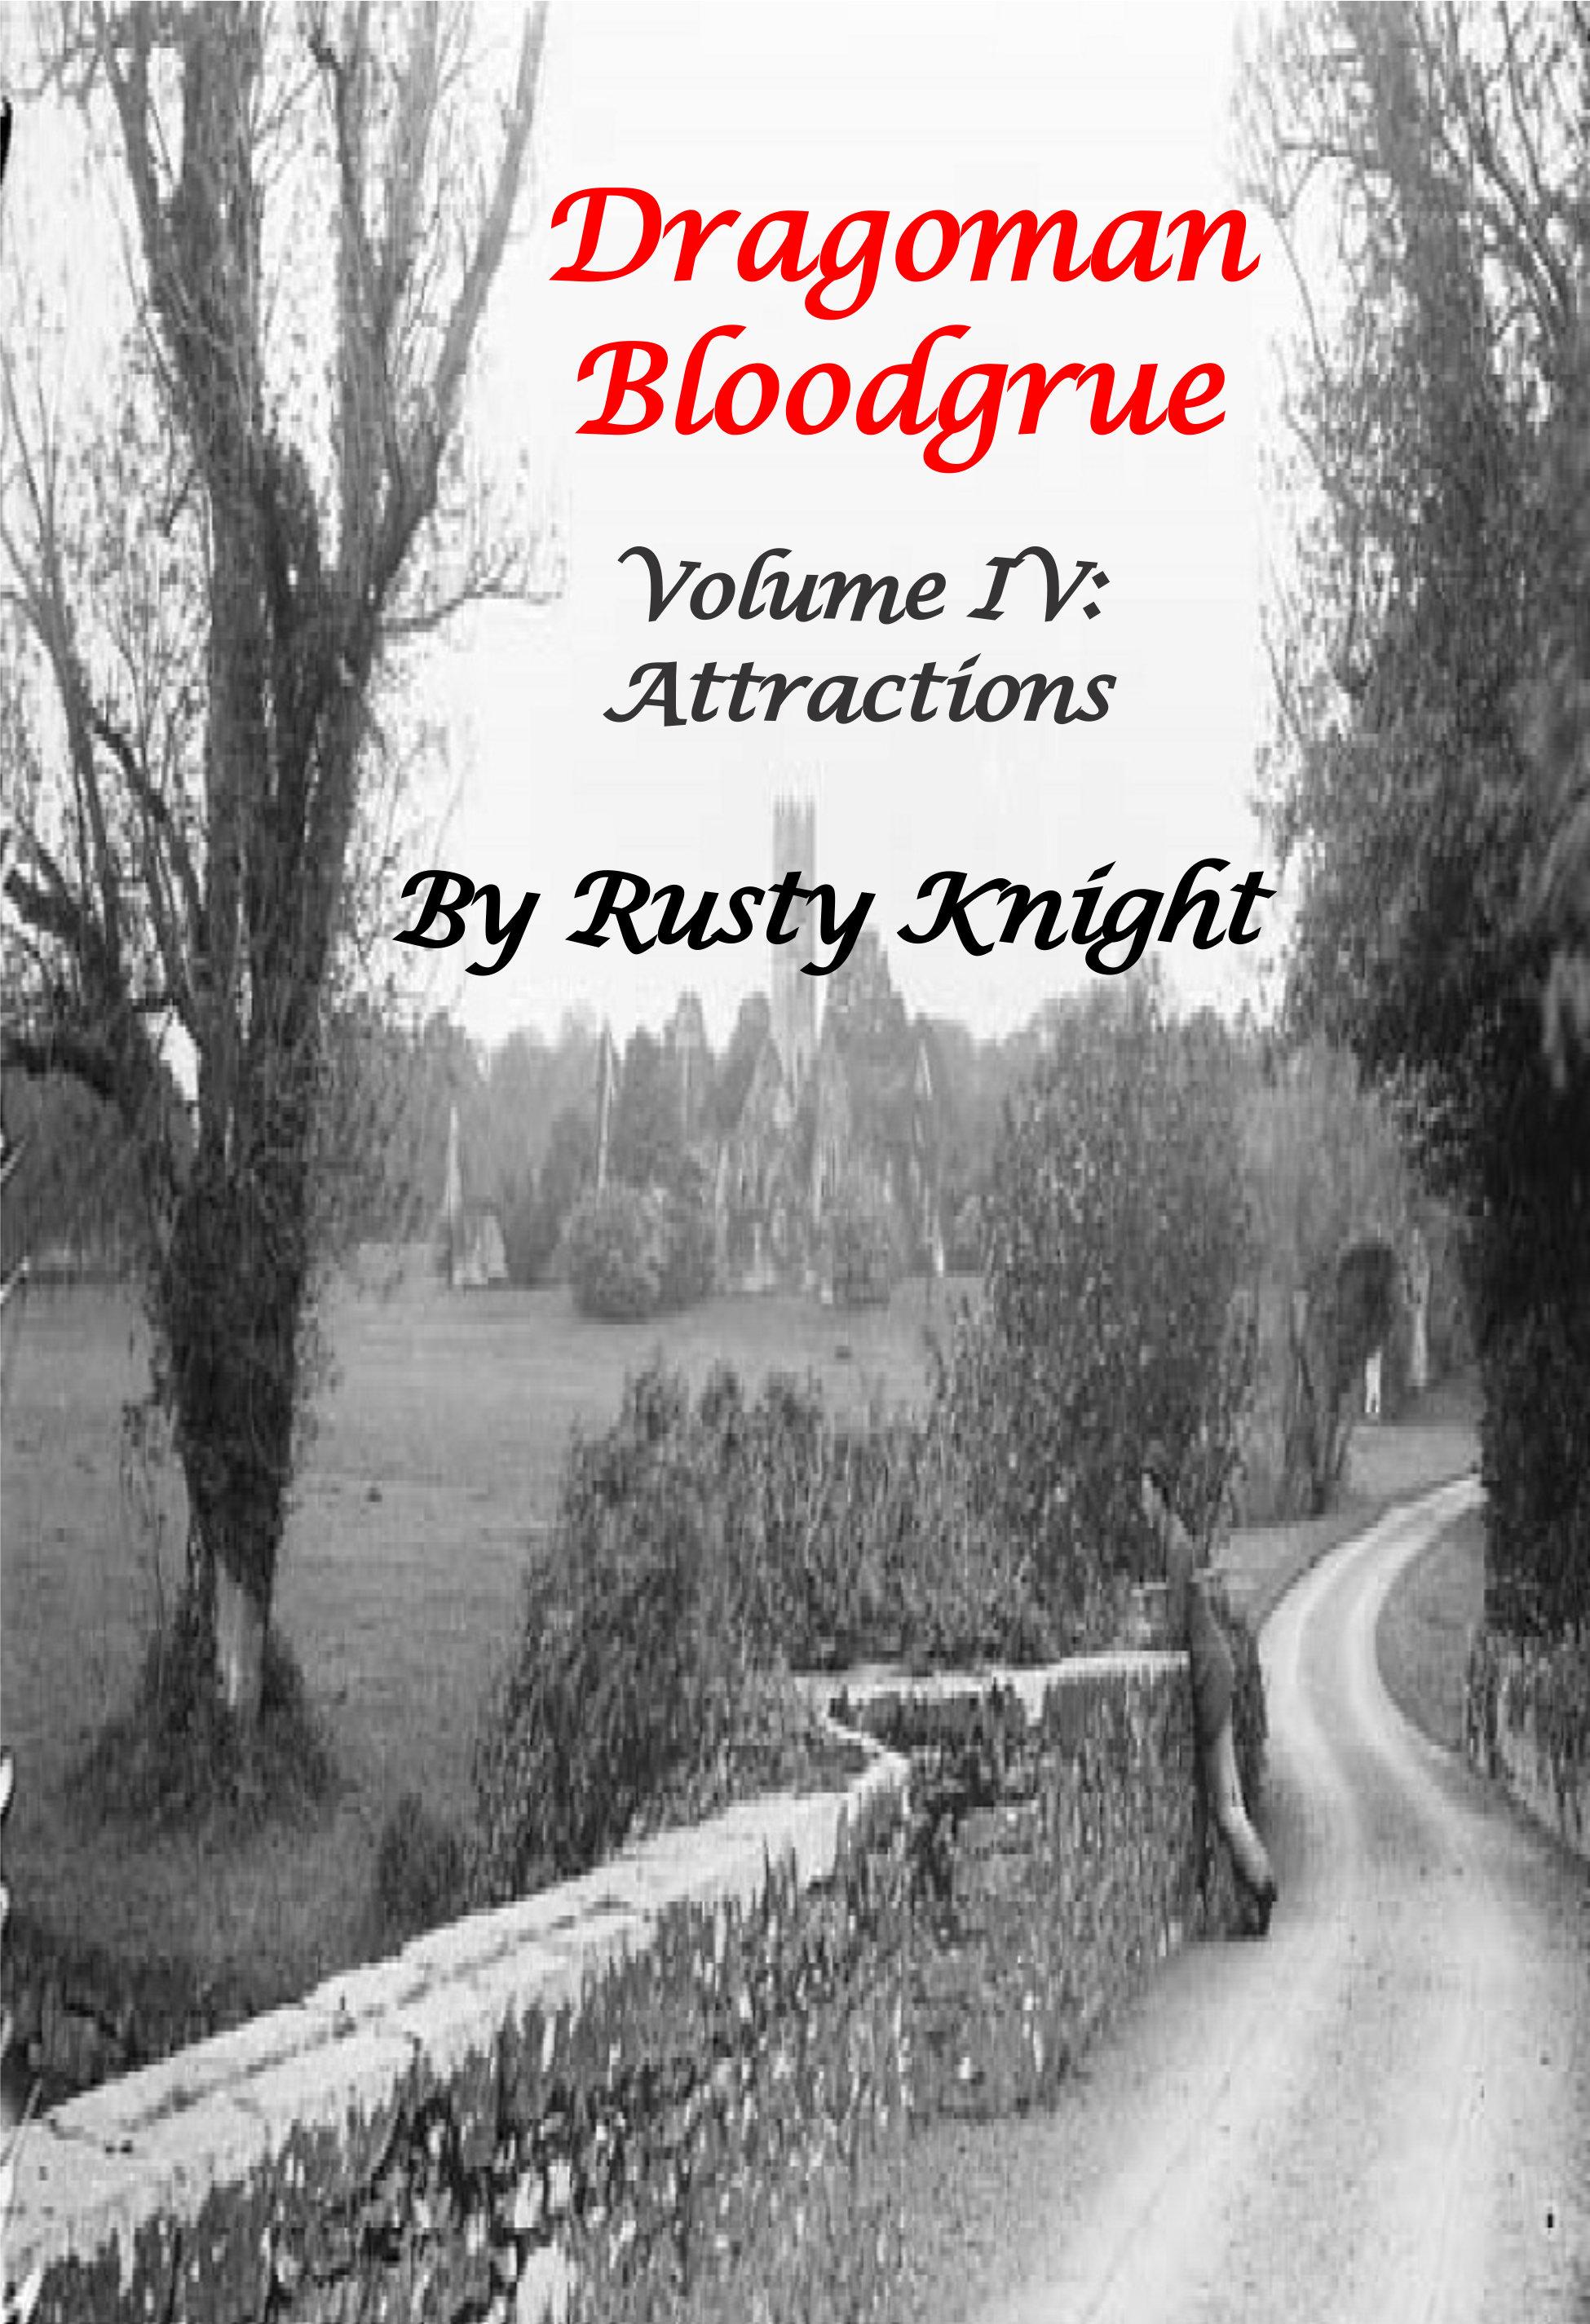 Dragoman Bloodgrue Volume IV: Attractions, e-copy DB17DCV004